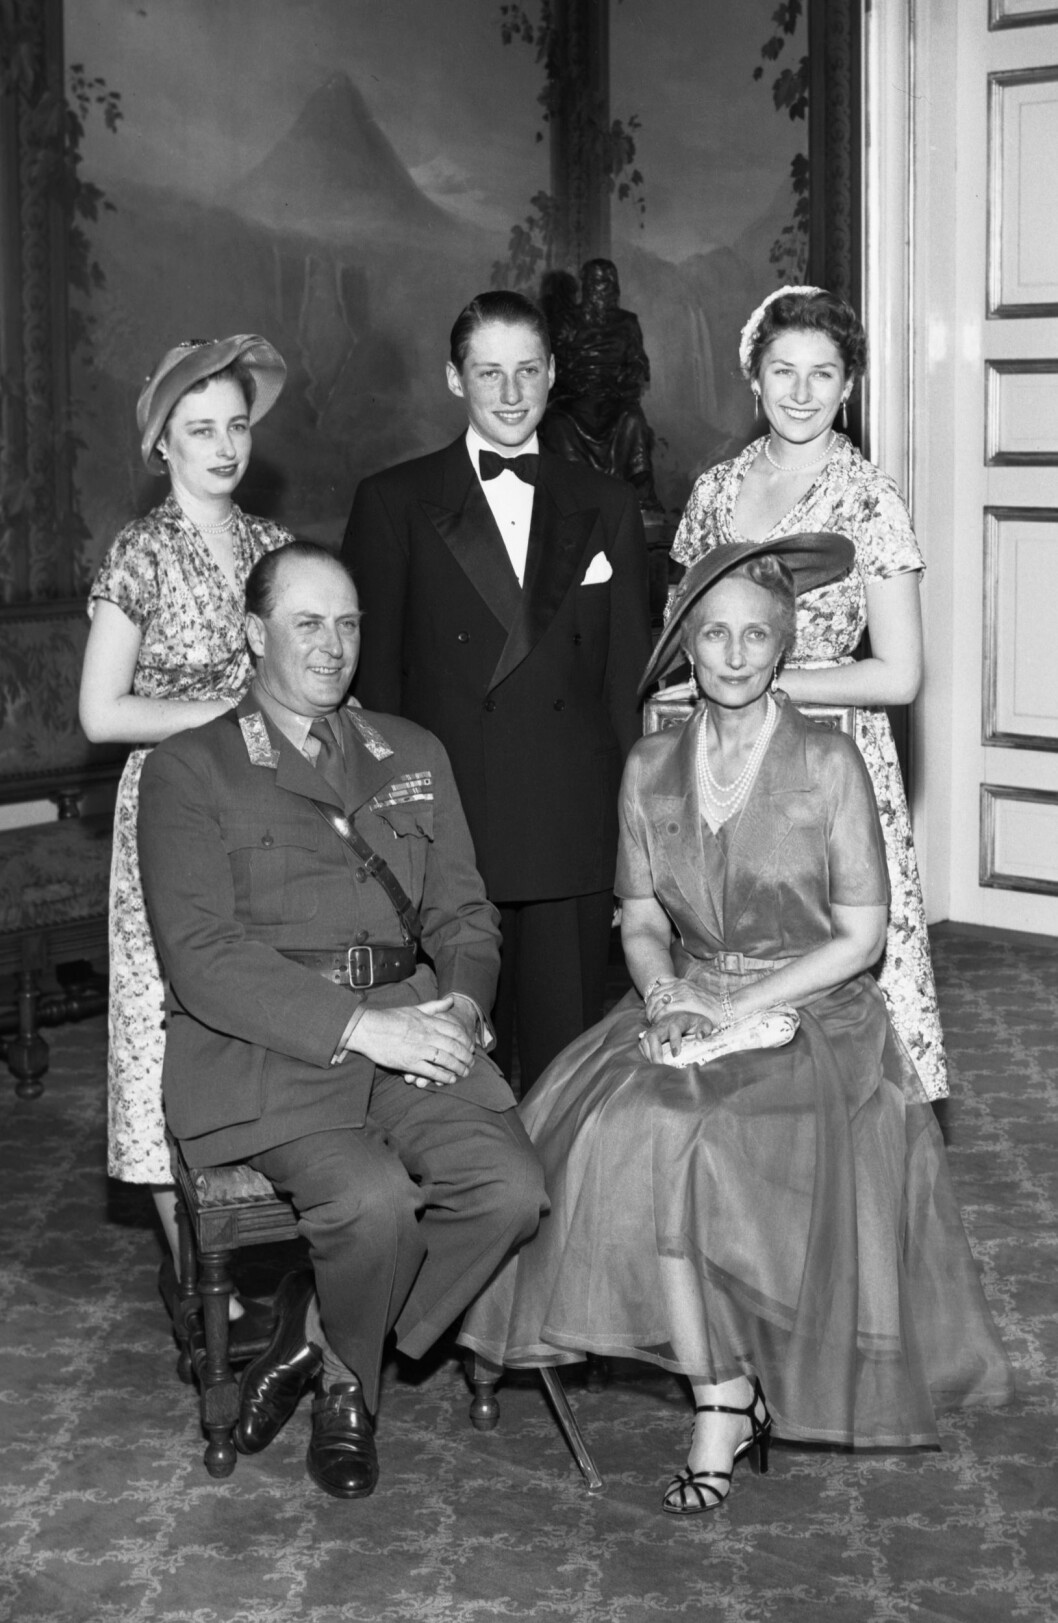 1953: Kronprinsparets yngste barn, prins Harald, ble konfirmert alene i Slottskapellet på Akershus i 1953. Fra venstre: prinsesse Ragnhild, prins Harald og prinsesse Astrid. Foran: Kronprins Olav og hans kone kronprinsesse Märtha. Foto: NTB scanpix